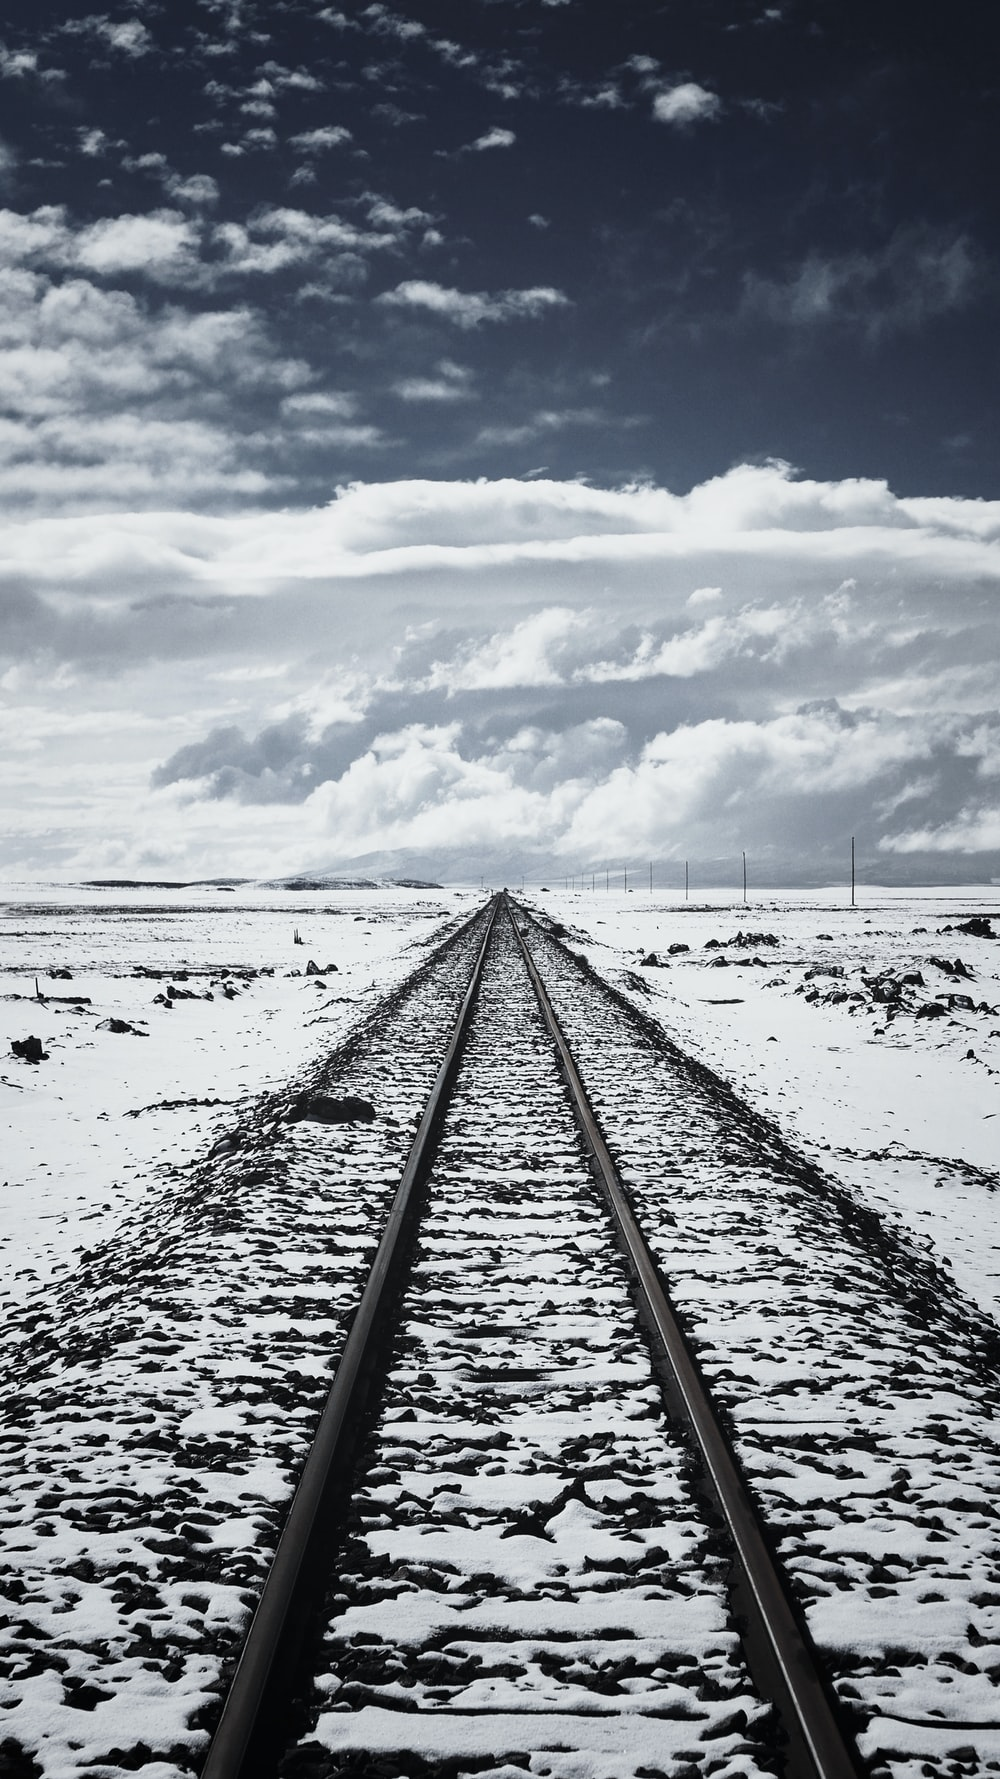 snow covered train rail under cloudy sky